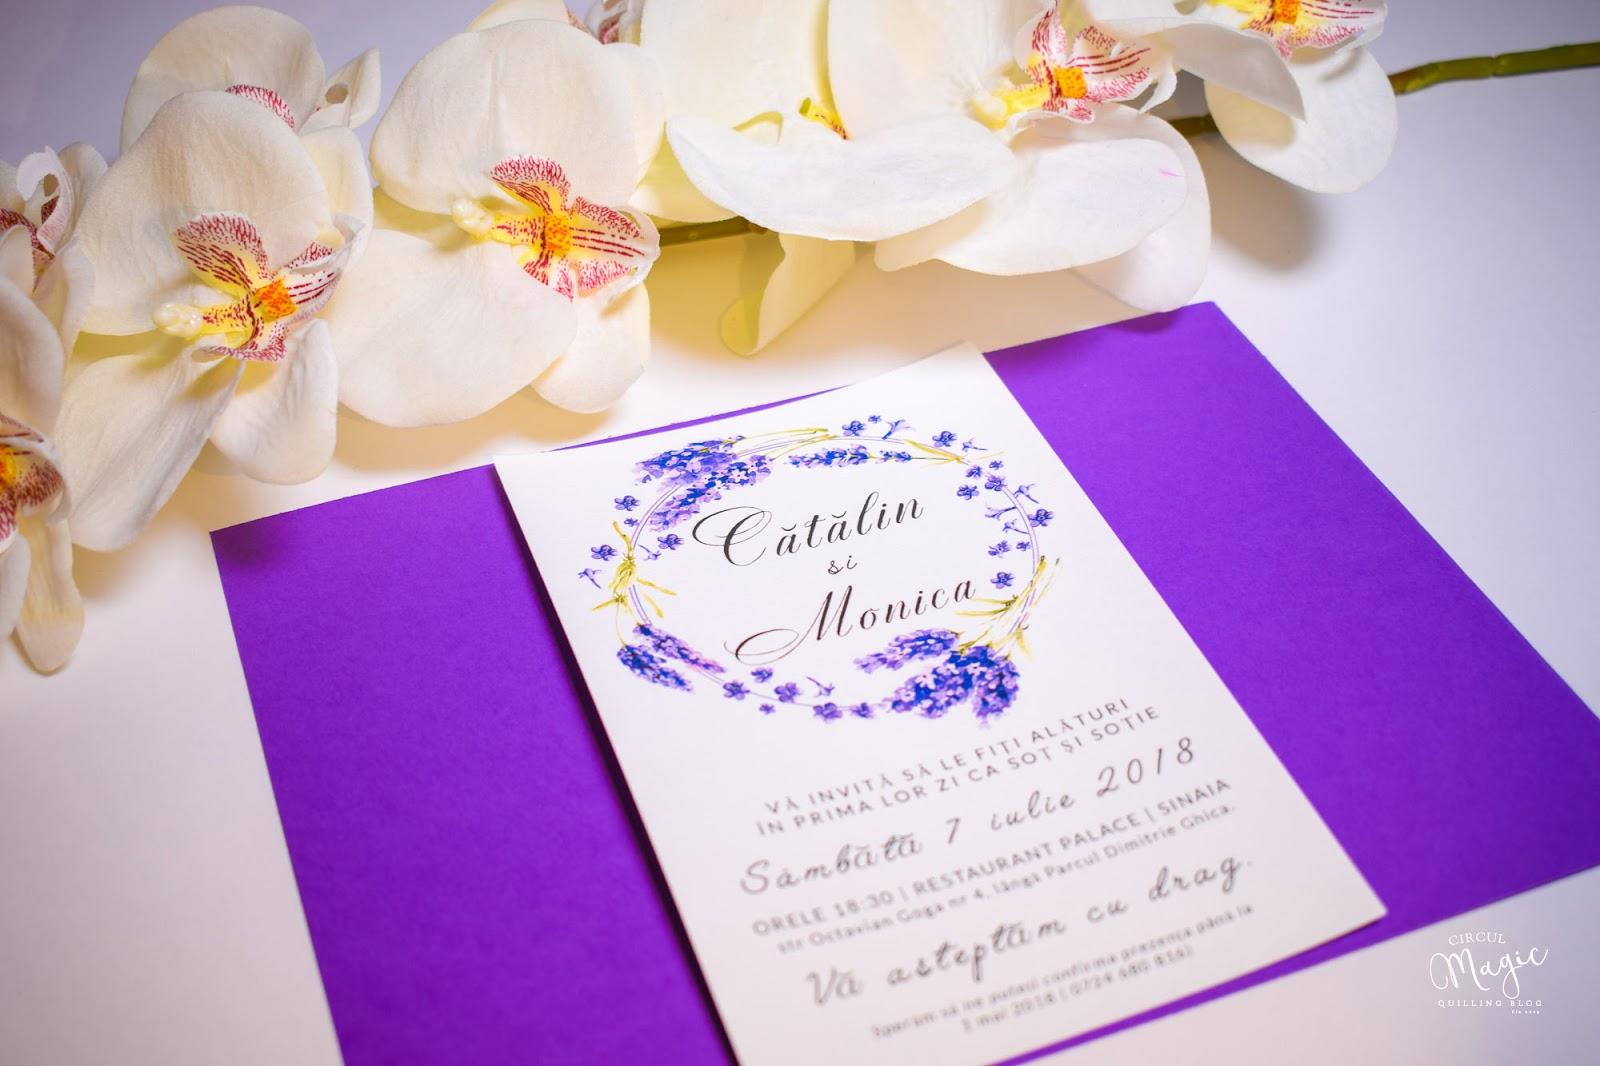 Invitatii Nunta Handmade cu Lavanda